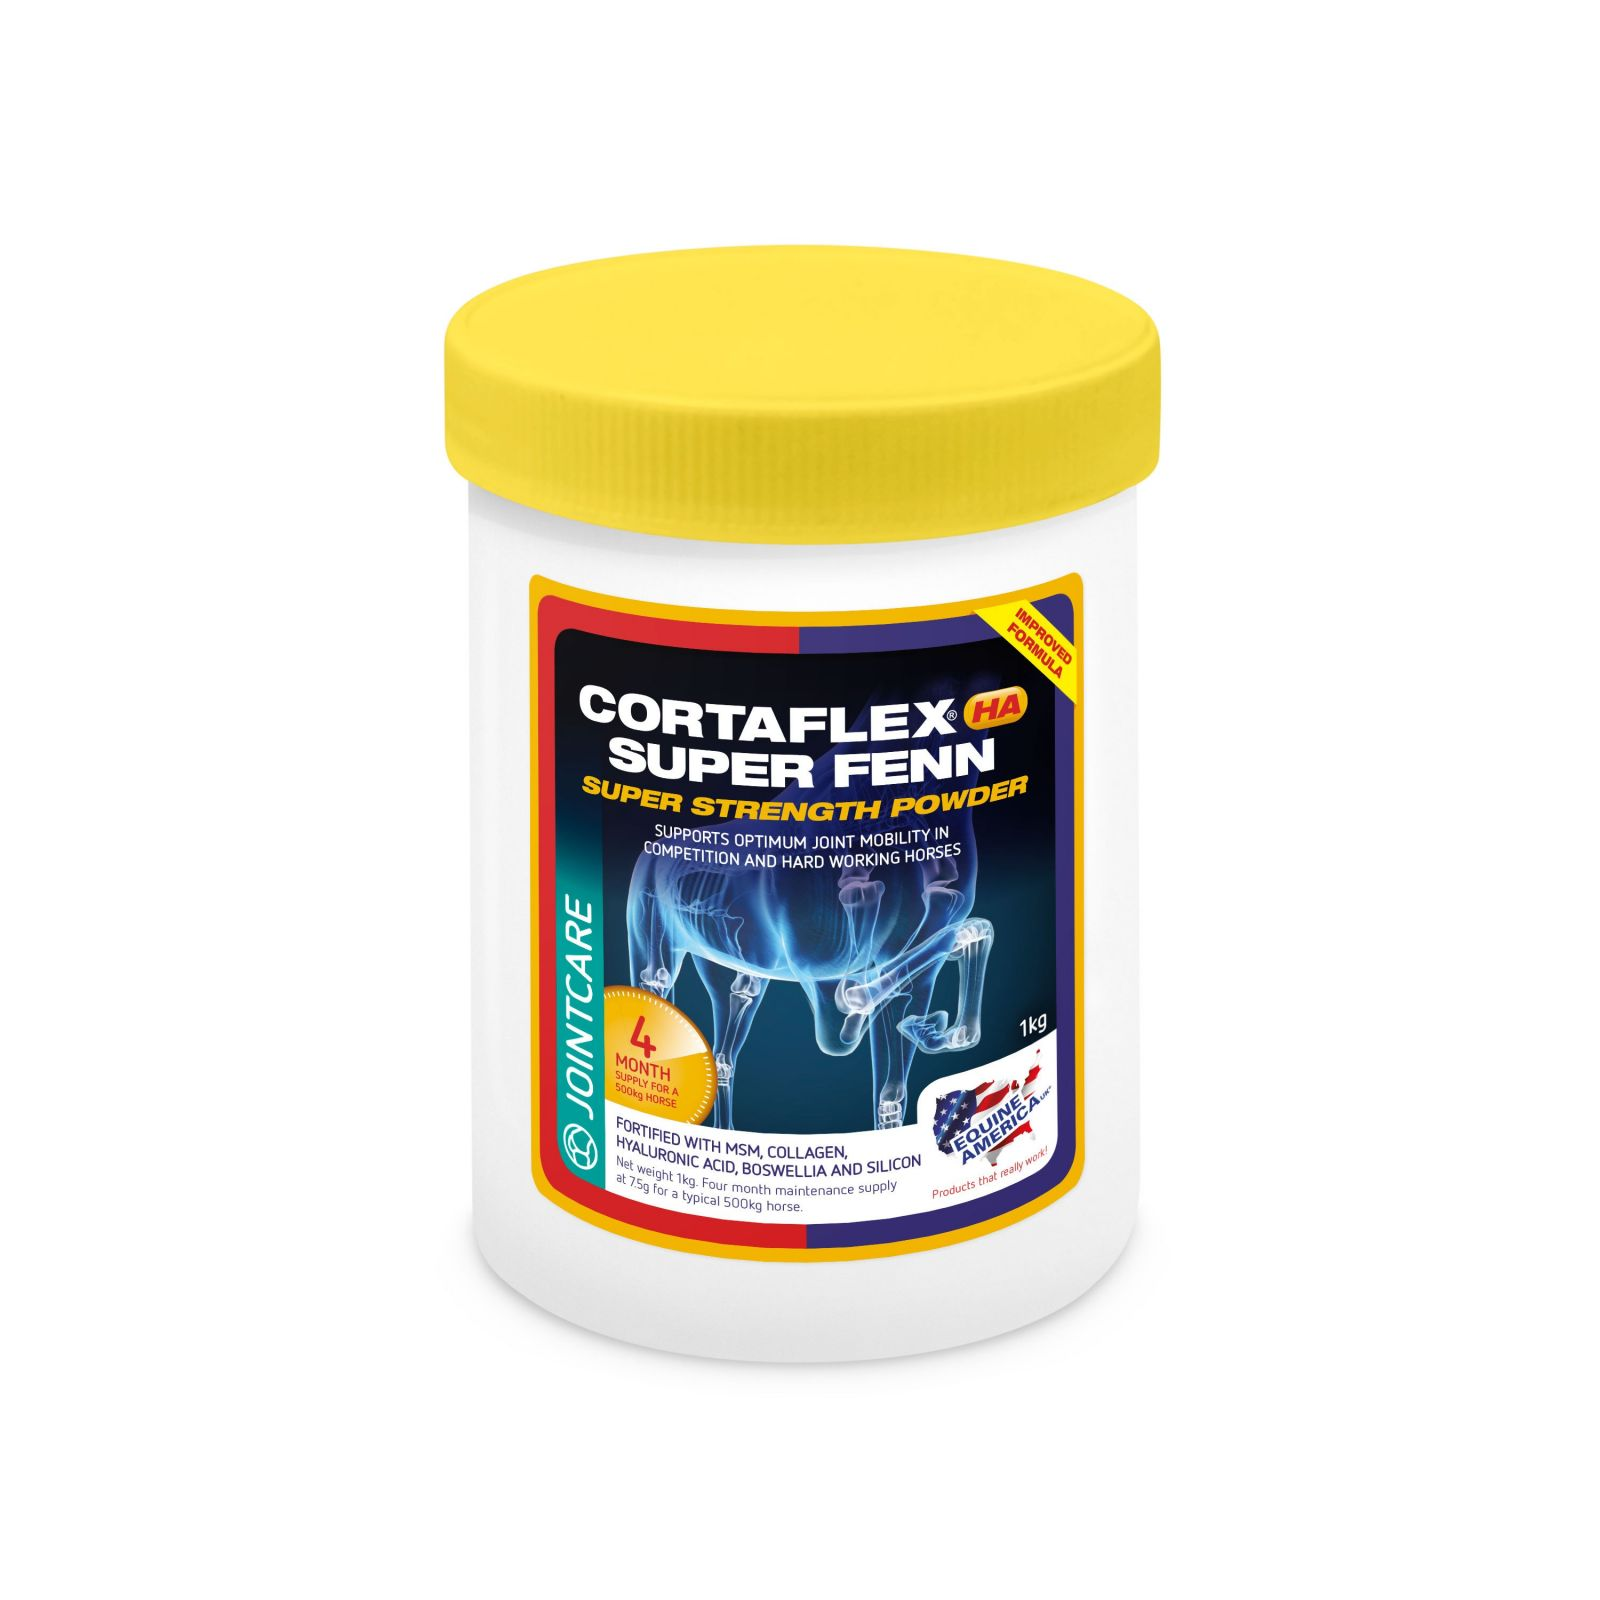 CORTAFLEX® HA SUPER FENN POWDER